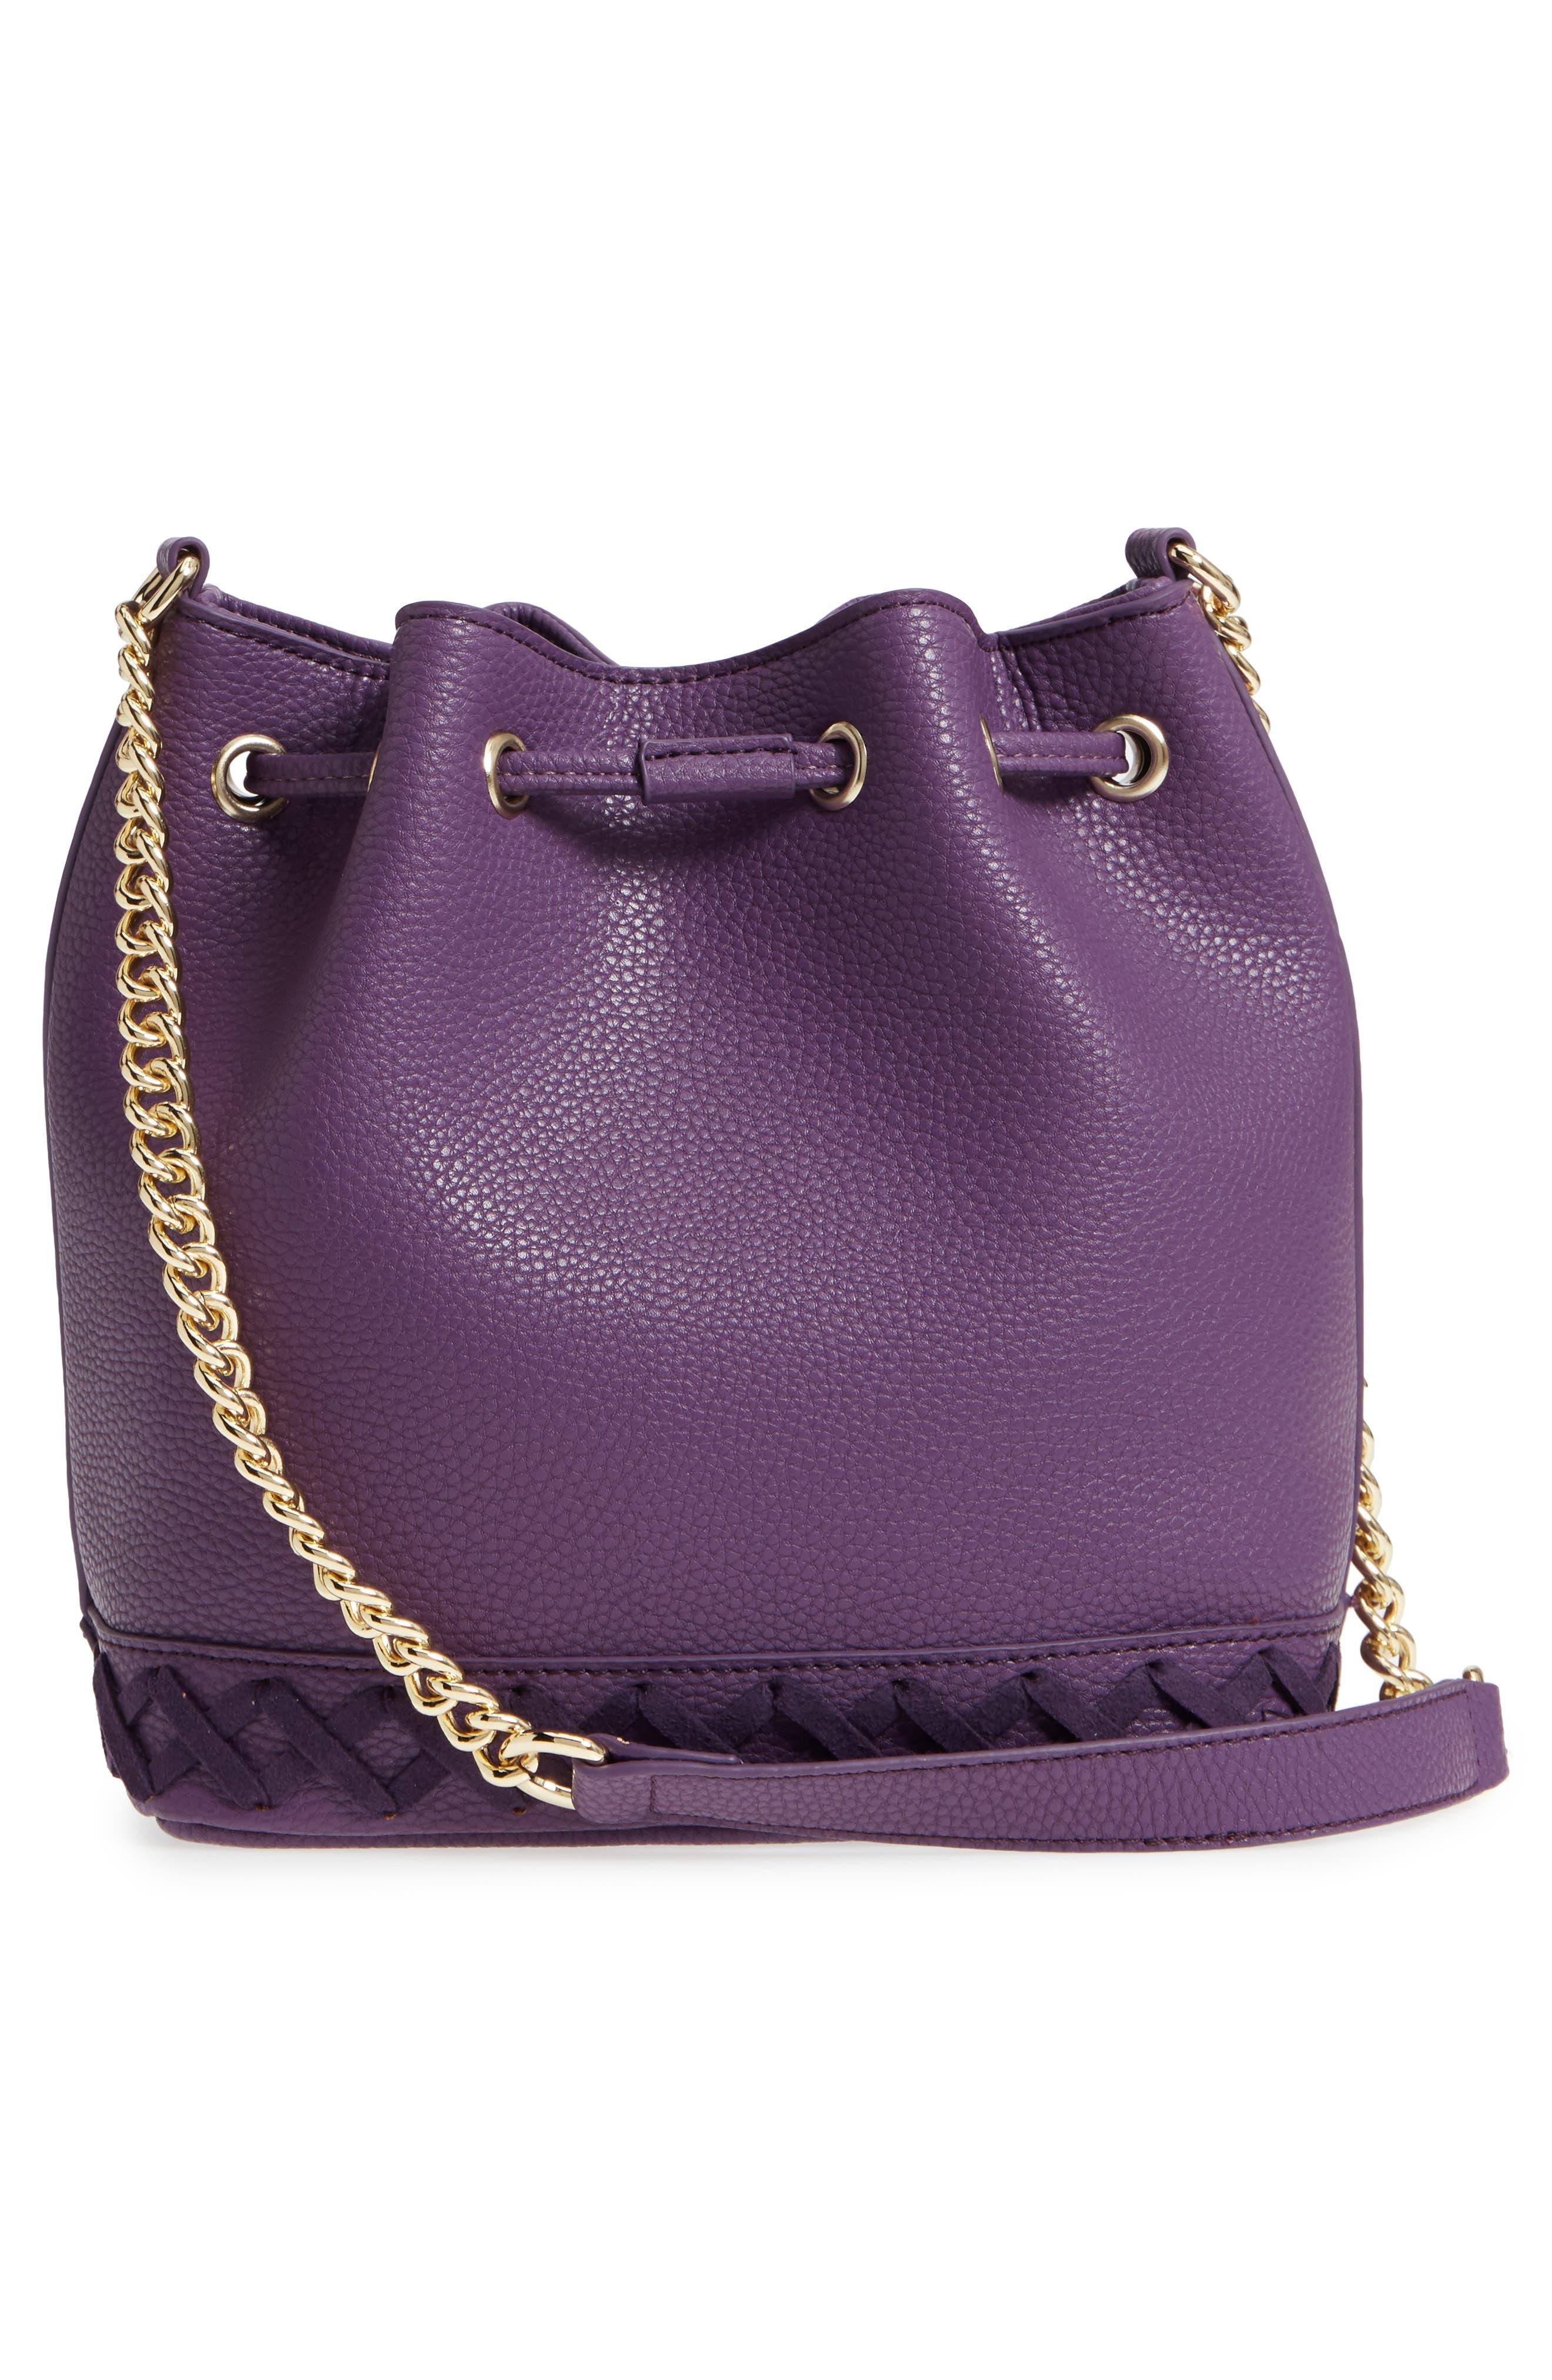 Veronica Faux Leather Bucket Bag,                             Alternate thumbnail 3, color,                             Purple